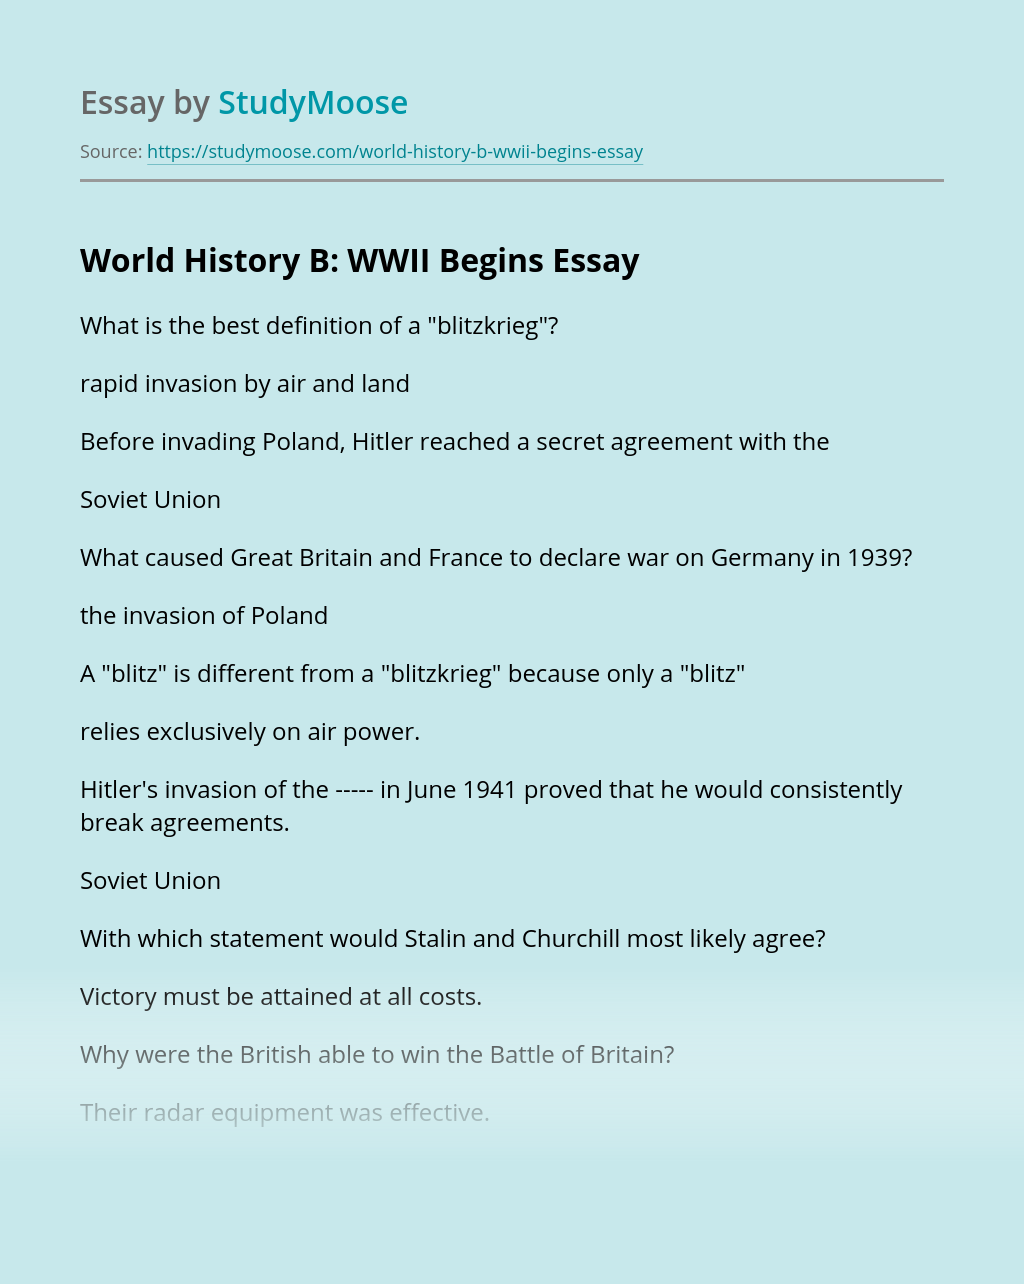 World History B: WWII Begins